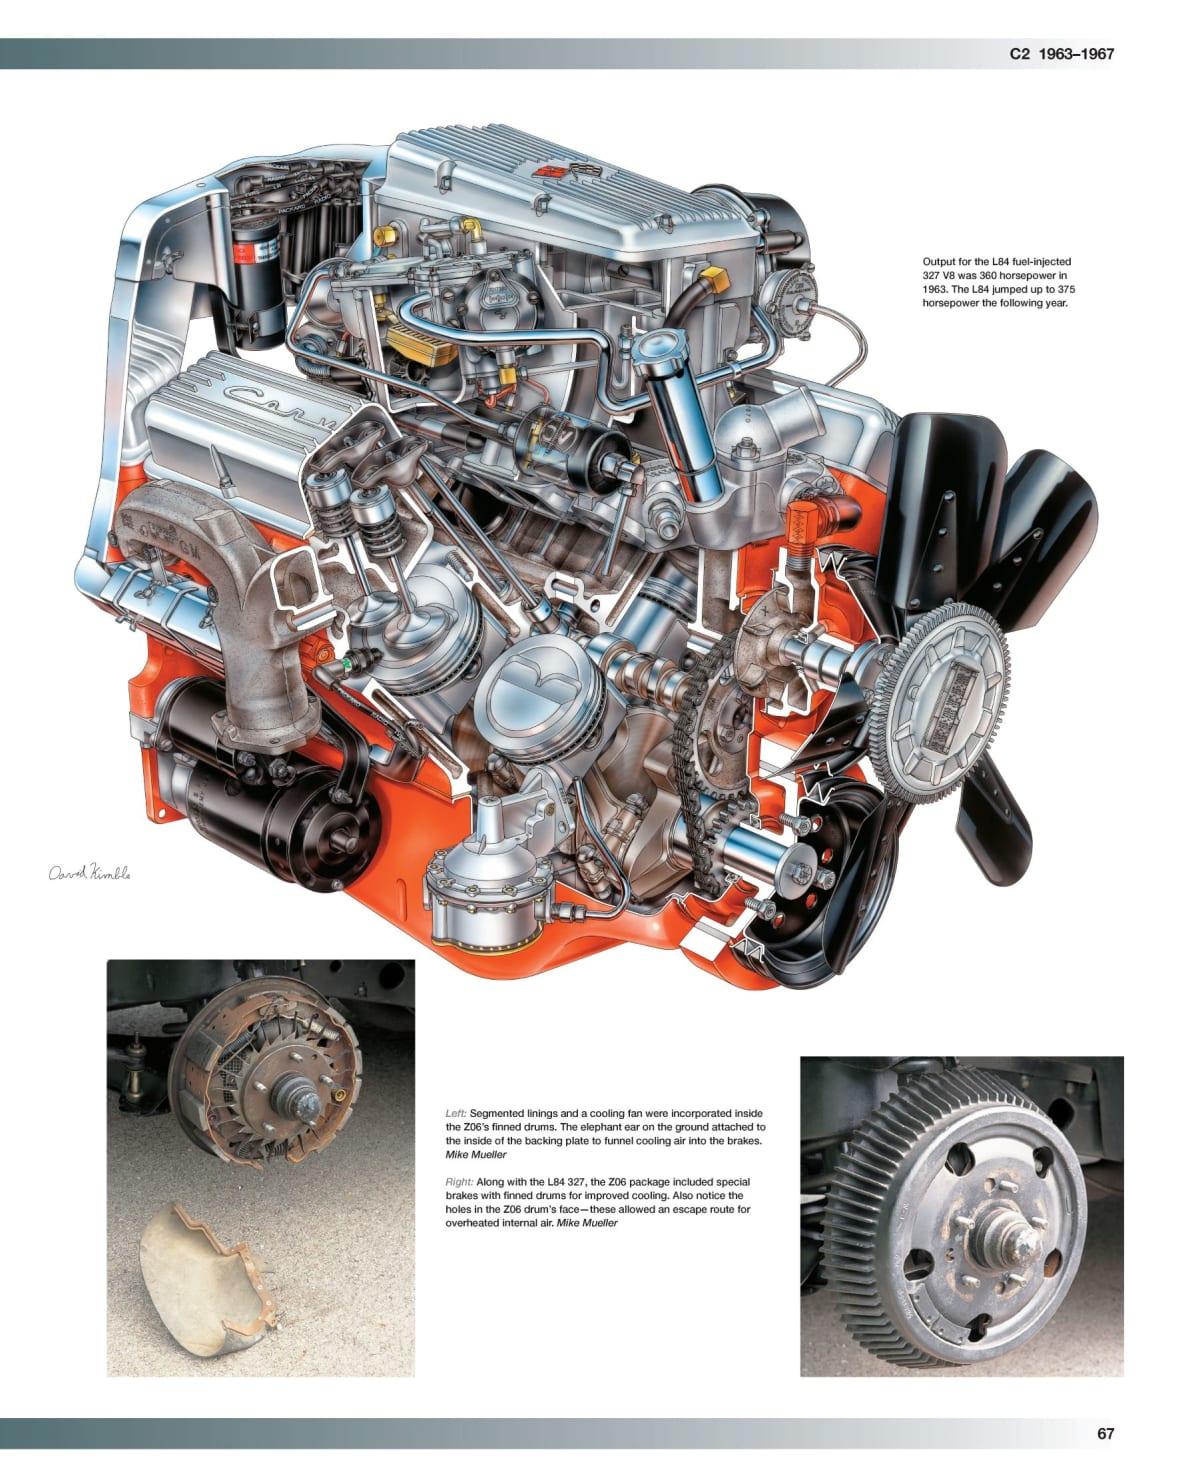 The L84 327 V8. Photo courtesy of Motorbooks, 2020